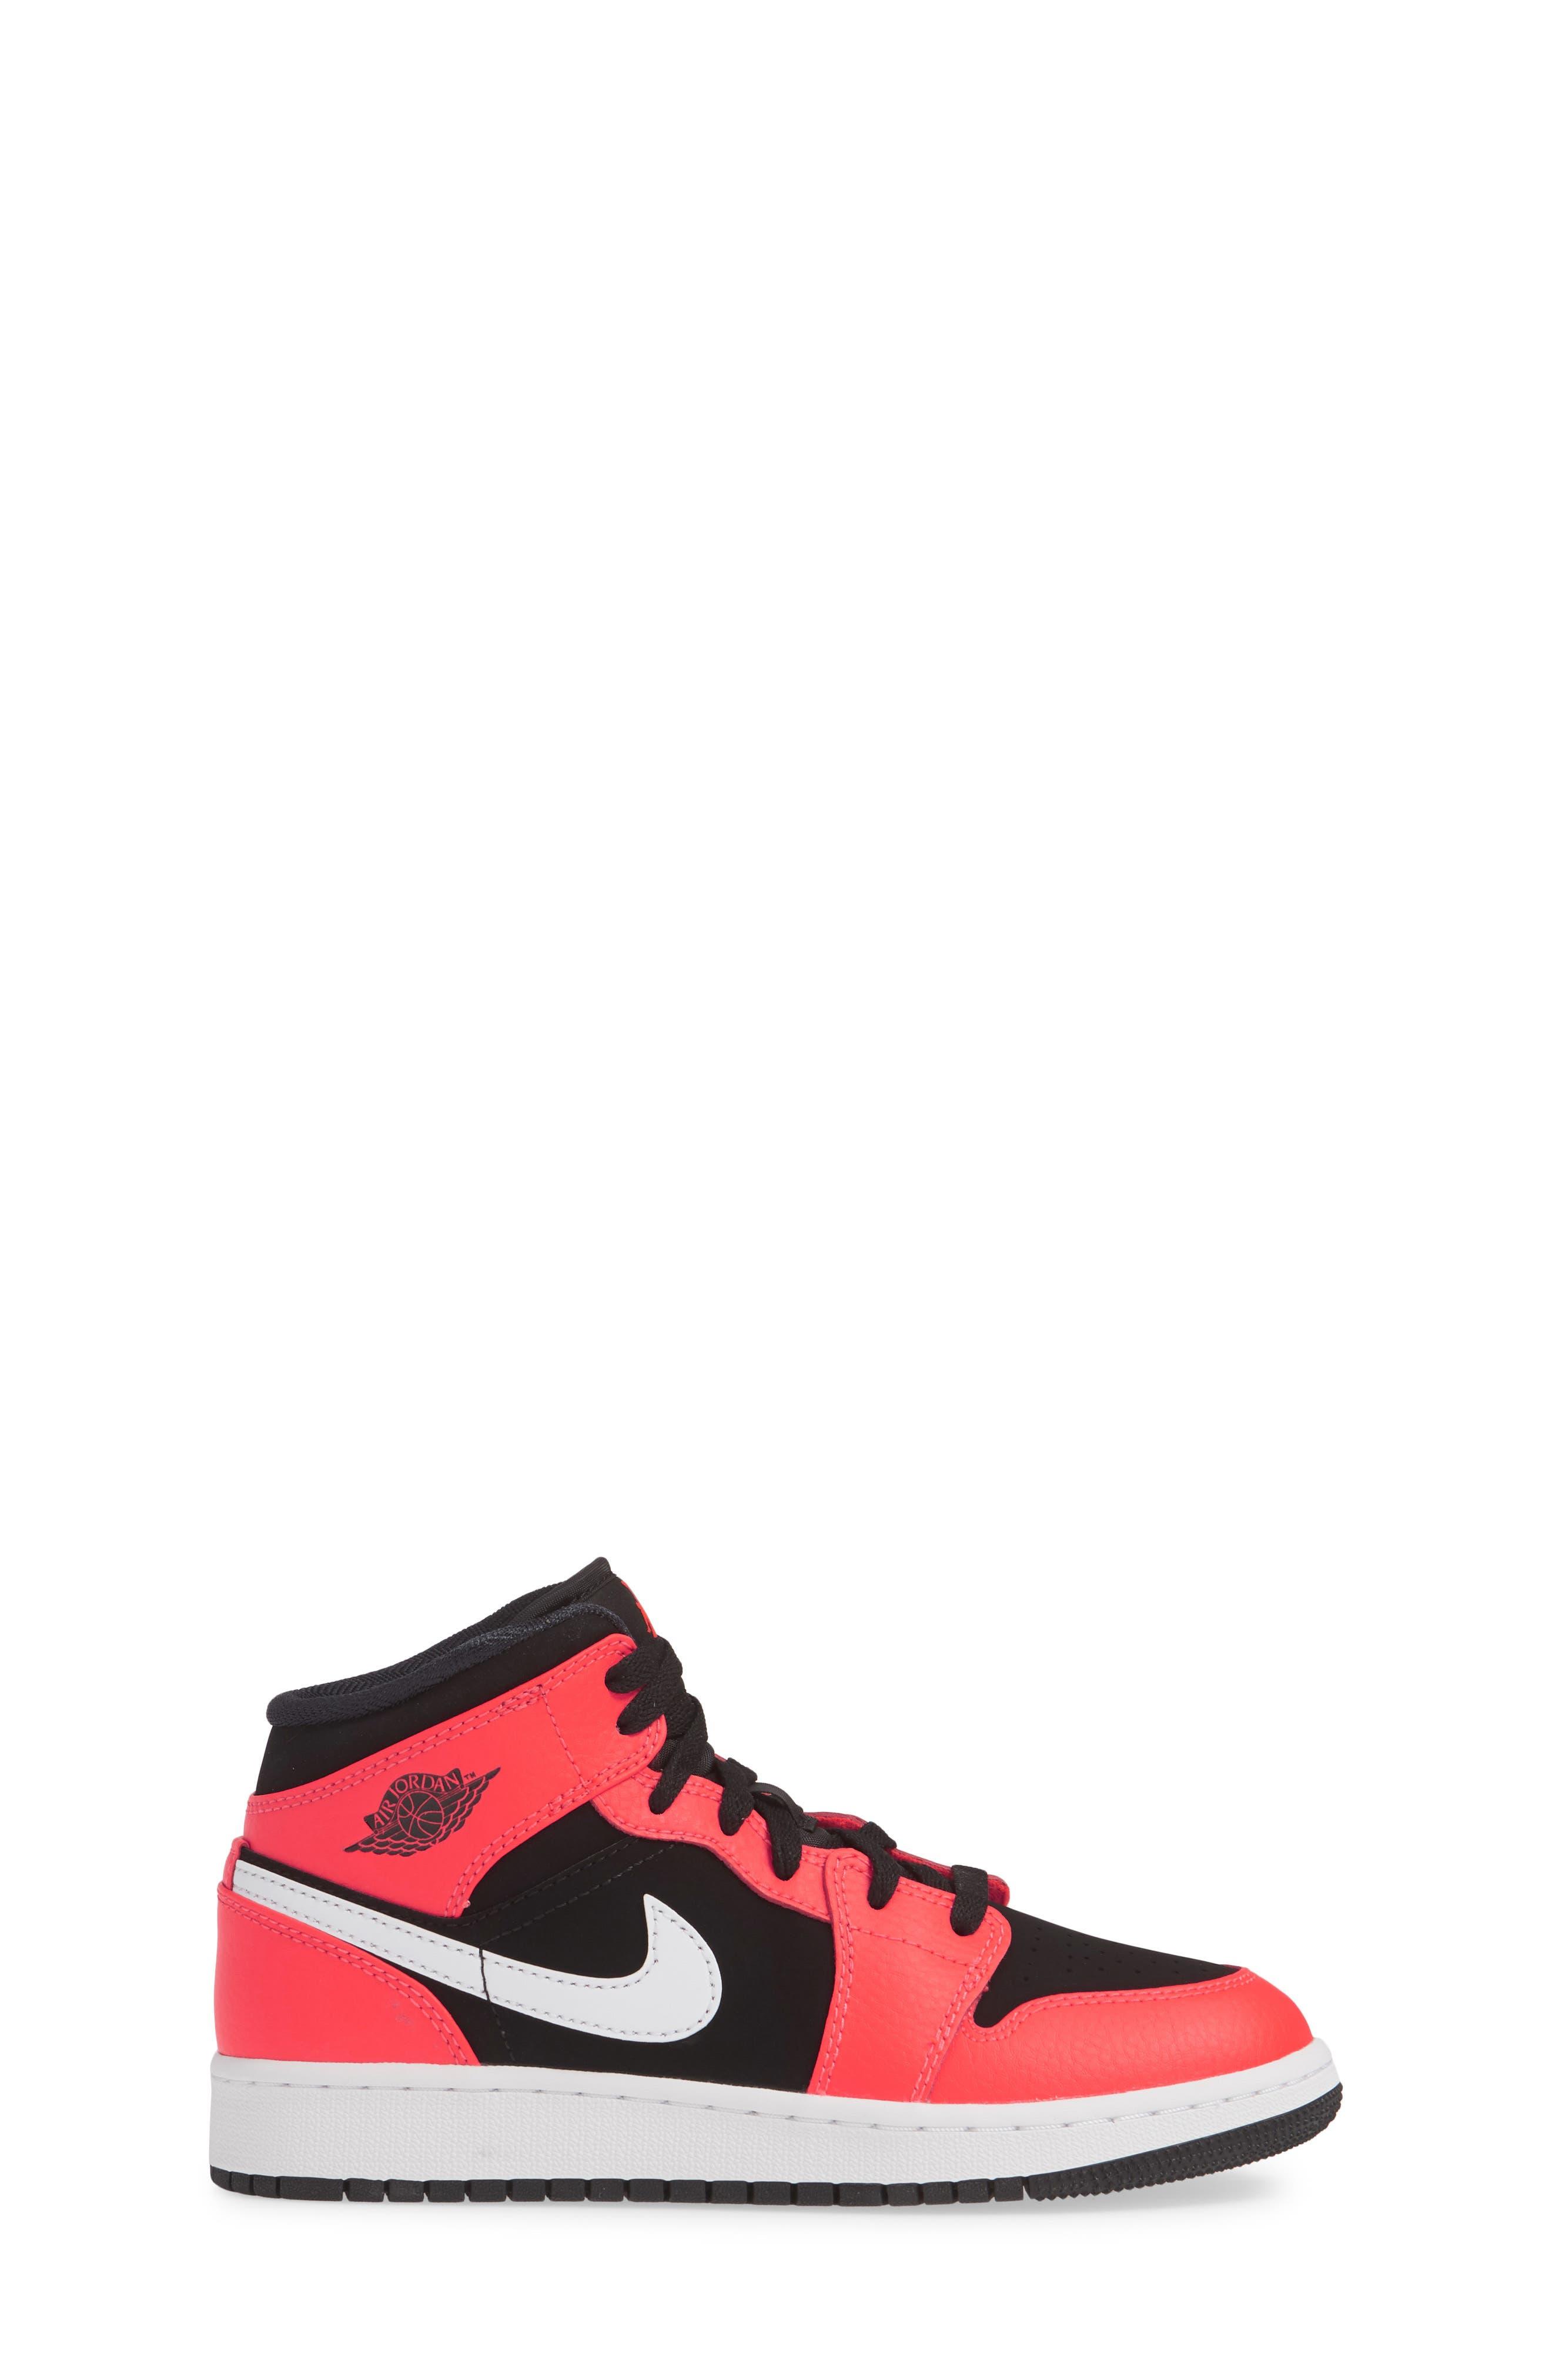 JORDAN, Nike 'Air Jordan 1 Mid' Sneaker, Alternate thumbnail 3, color, BLACK/ INFRARED 23-WHITE